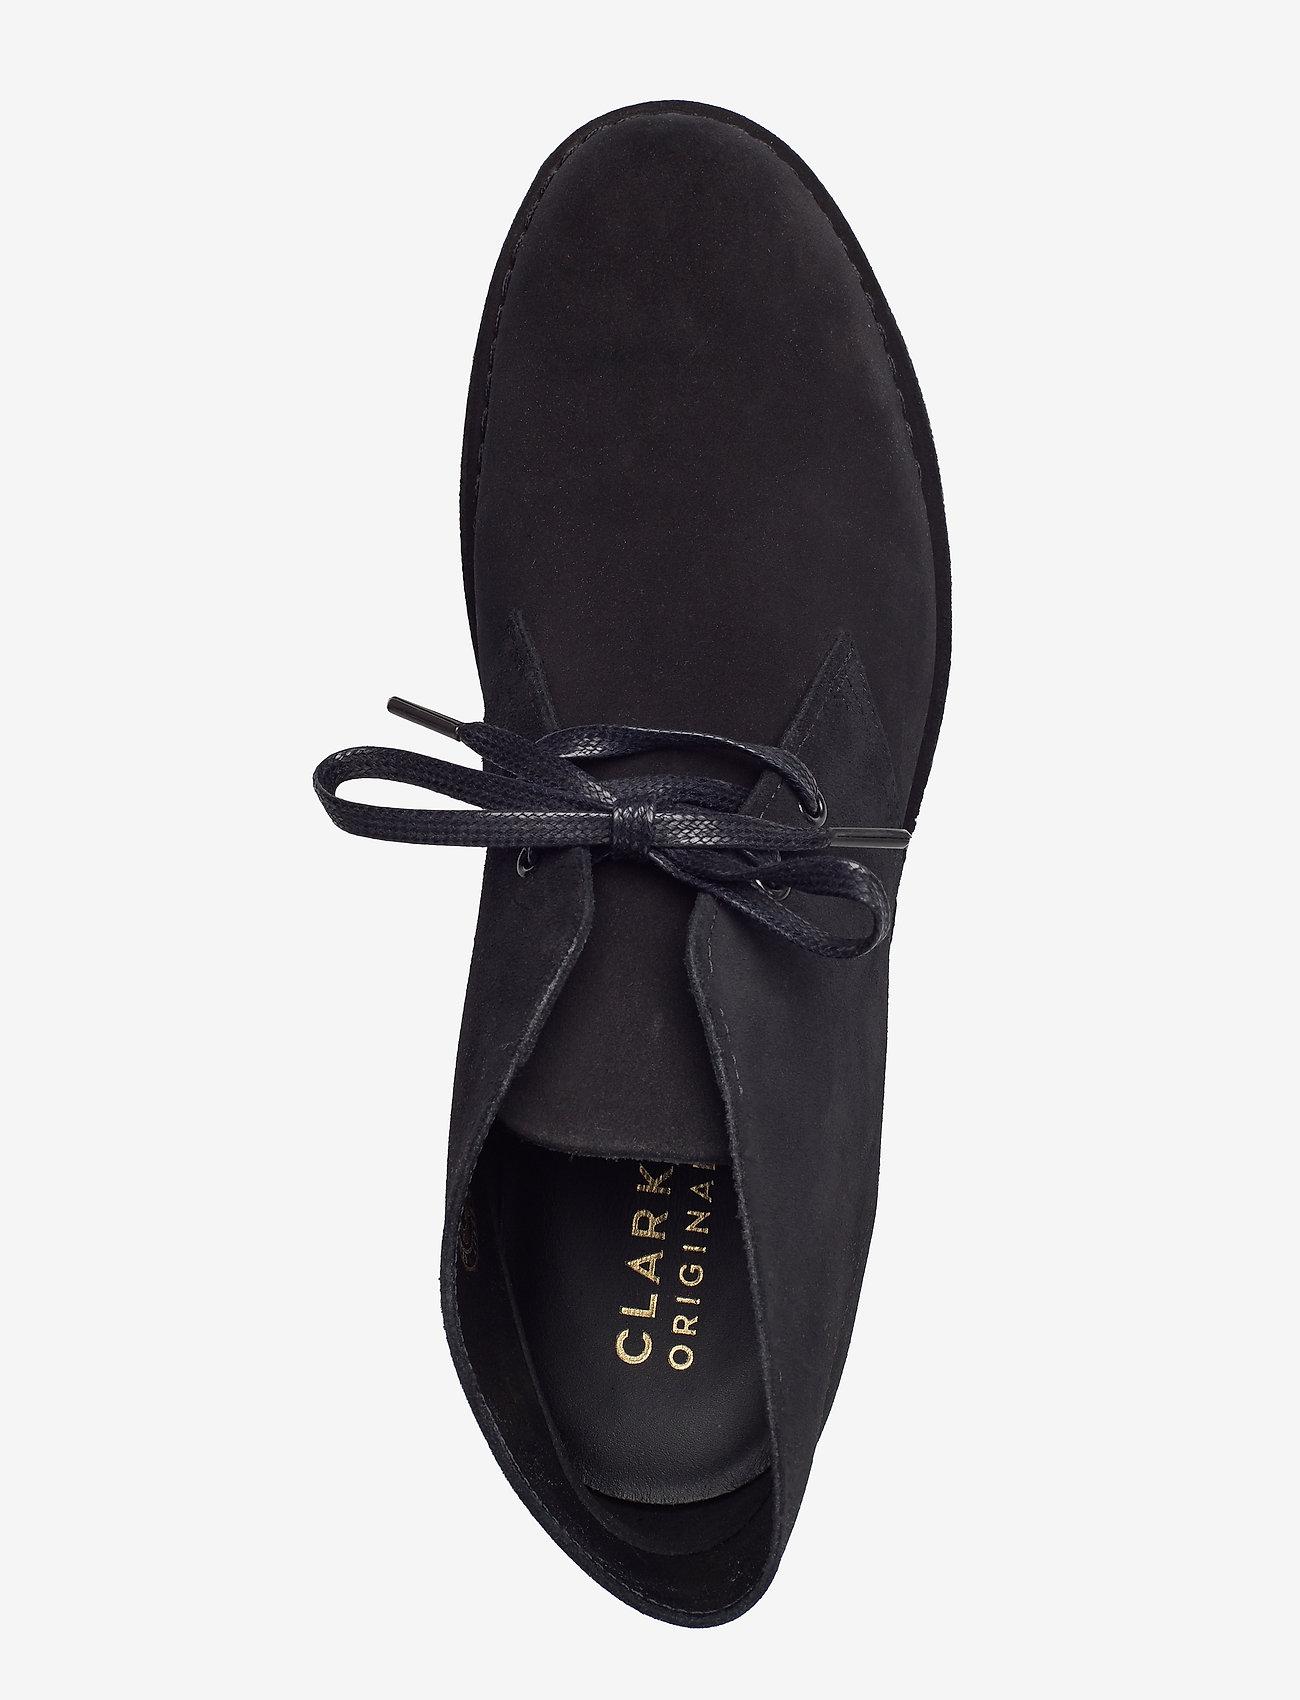 Clarks Originals - Desert Boot221 - Ökenkängor - black sde - 3